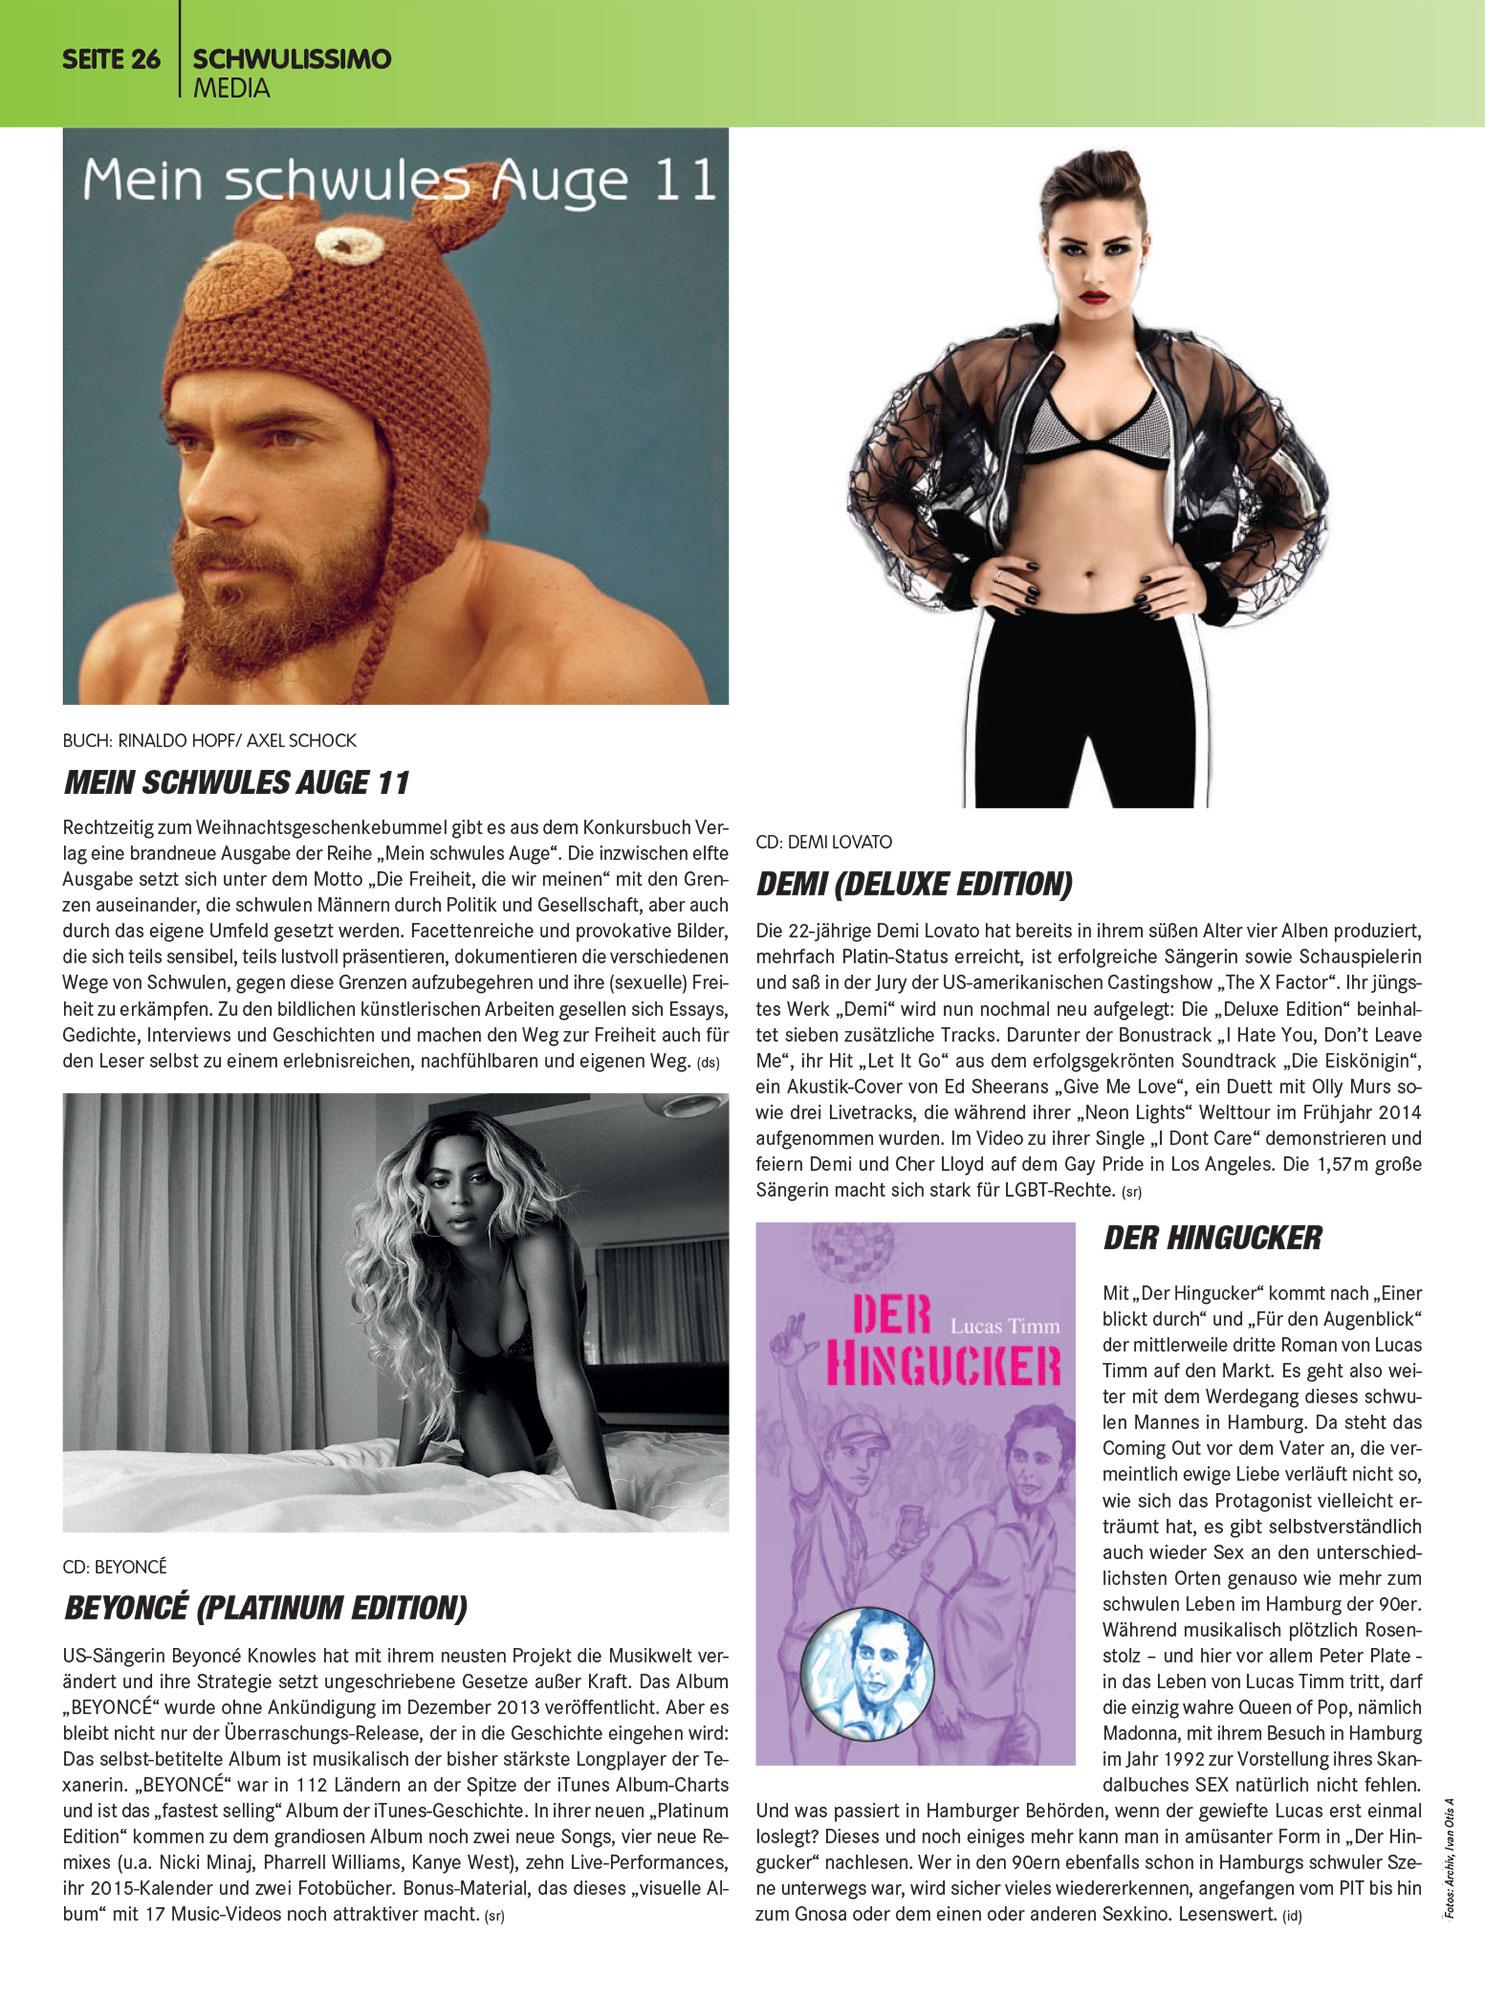 SCHWULISSIMO_Das_Magazin_12_2014_2.jpg